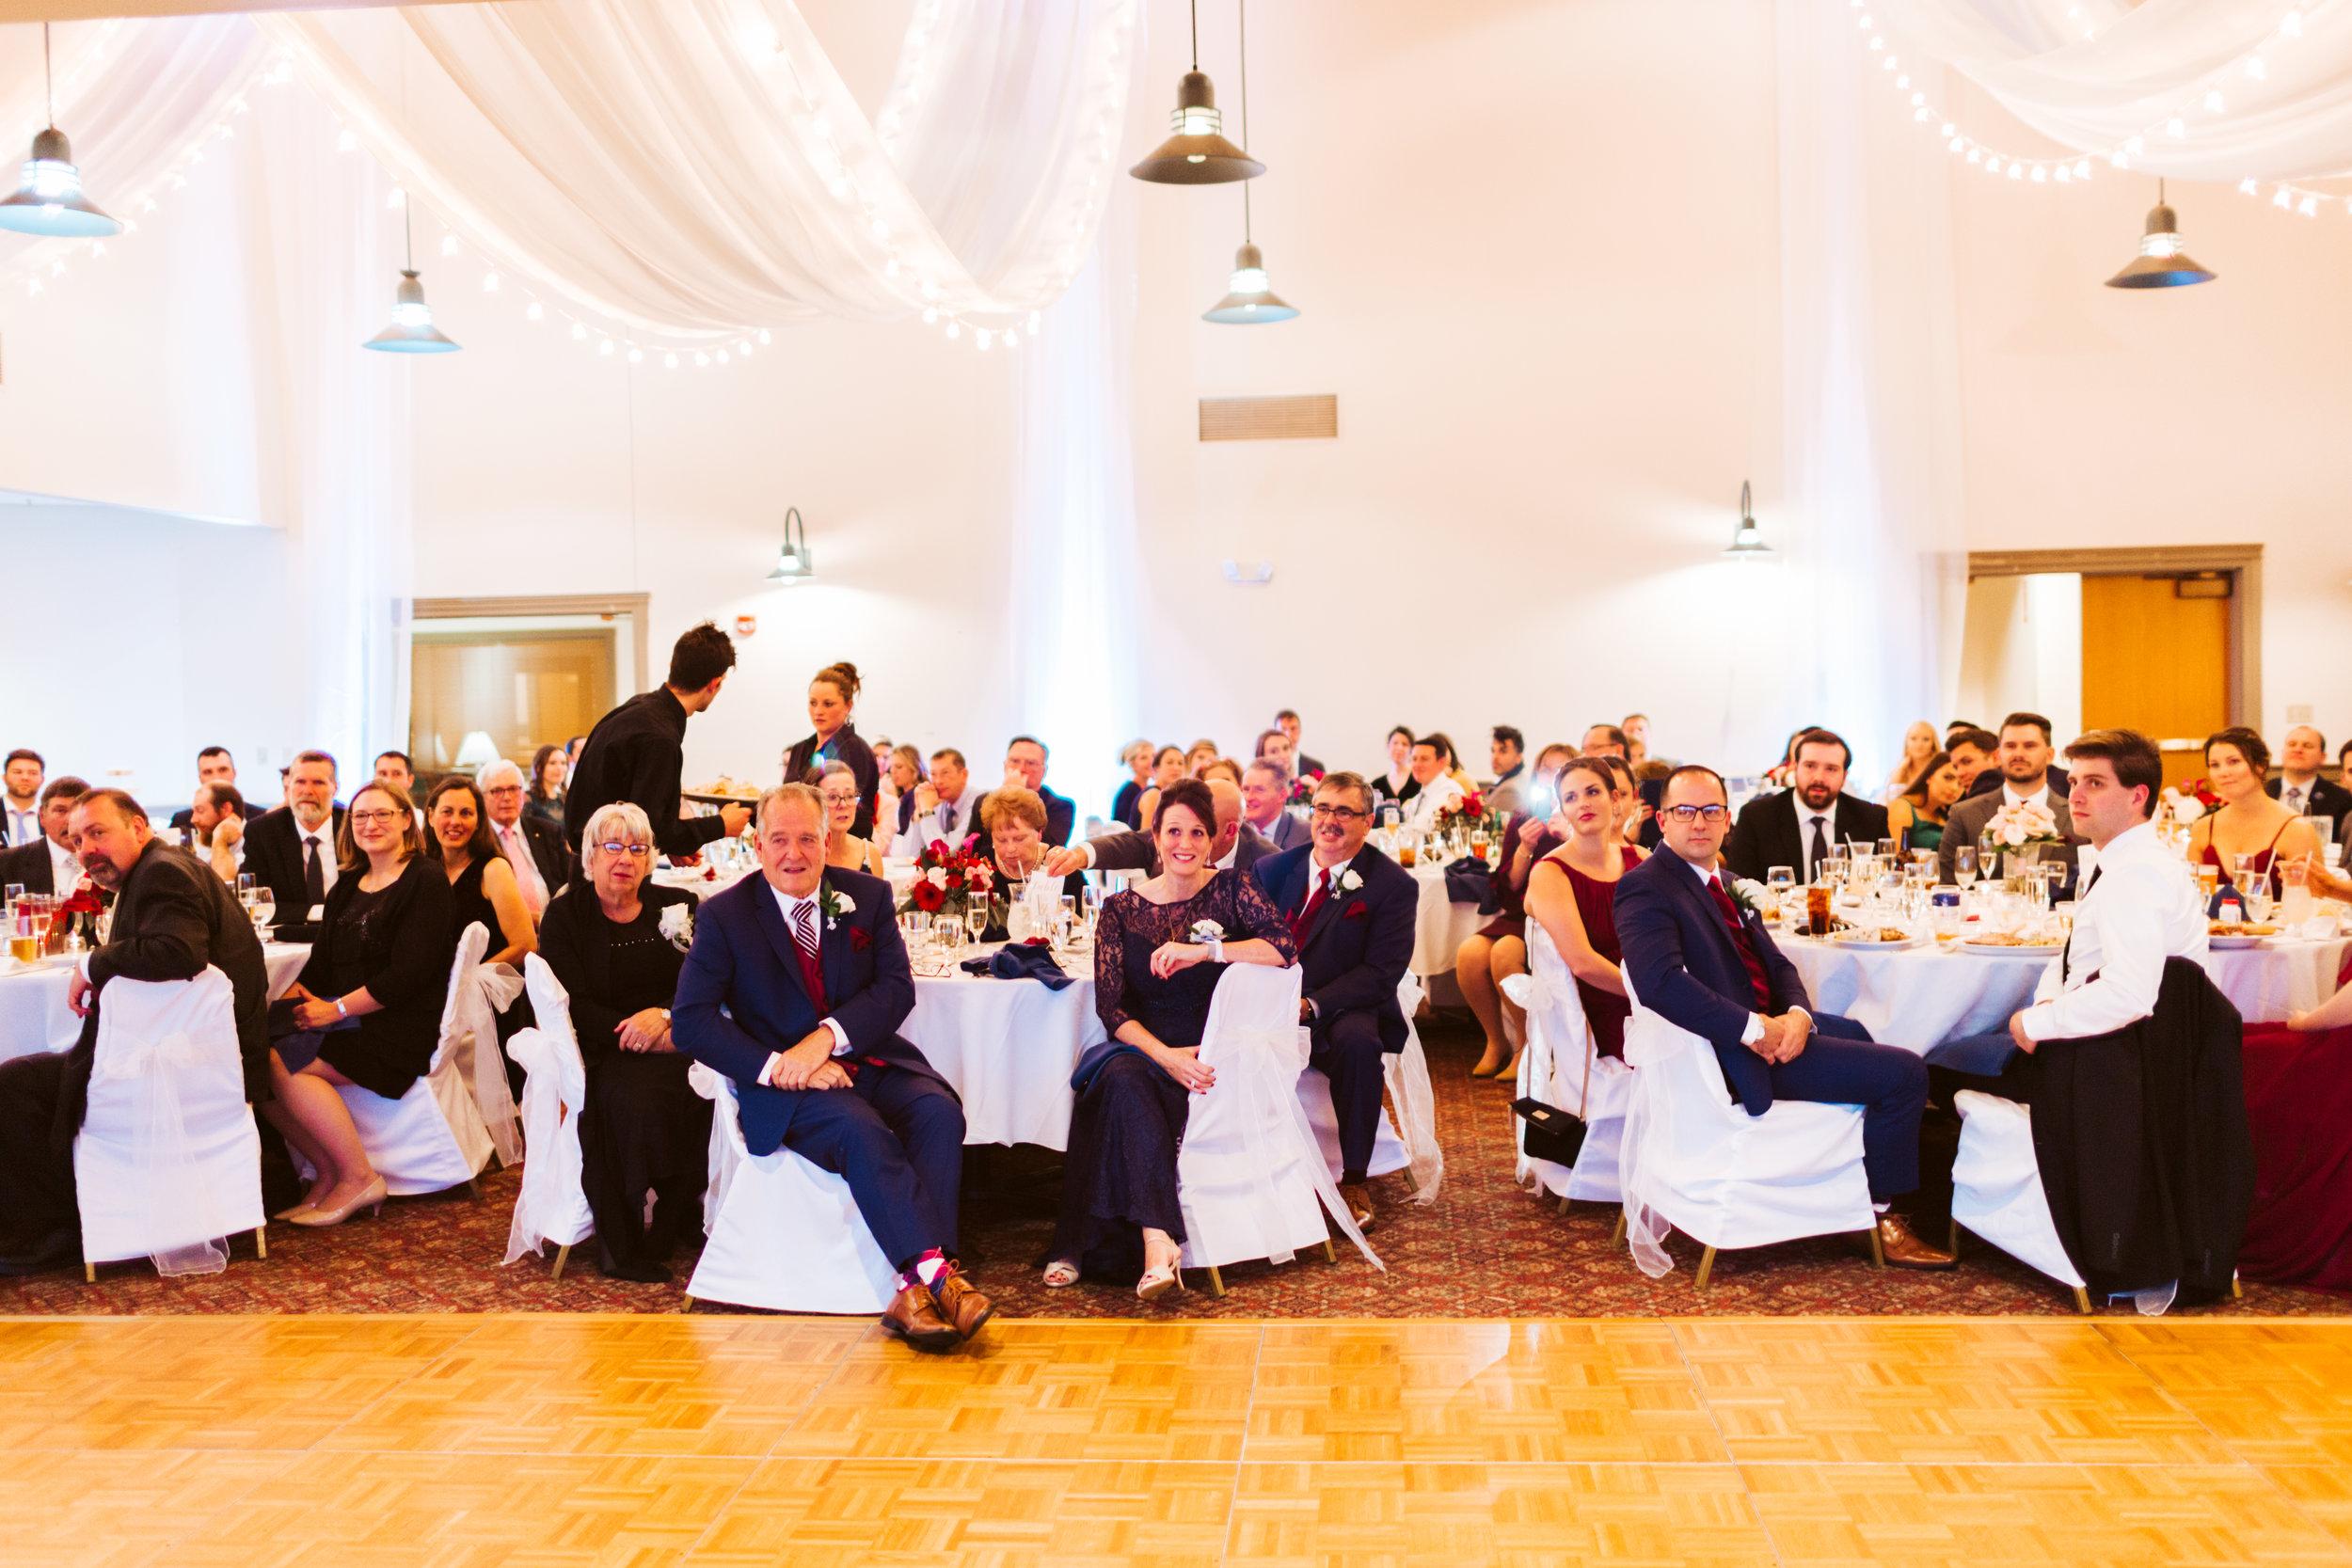 Jeff-and-Leslie-Wedding -8537.jpg